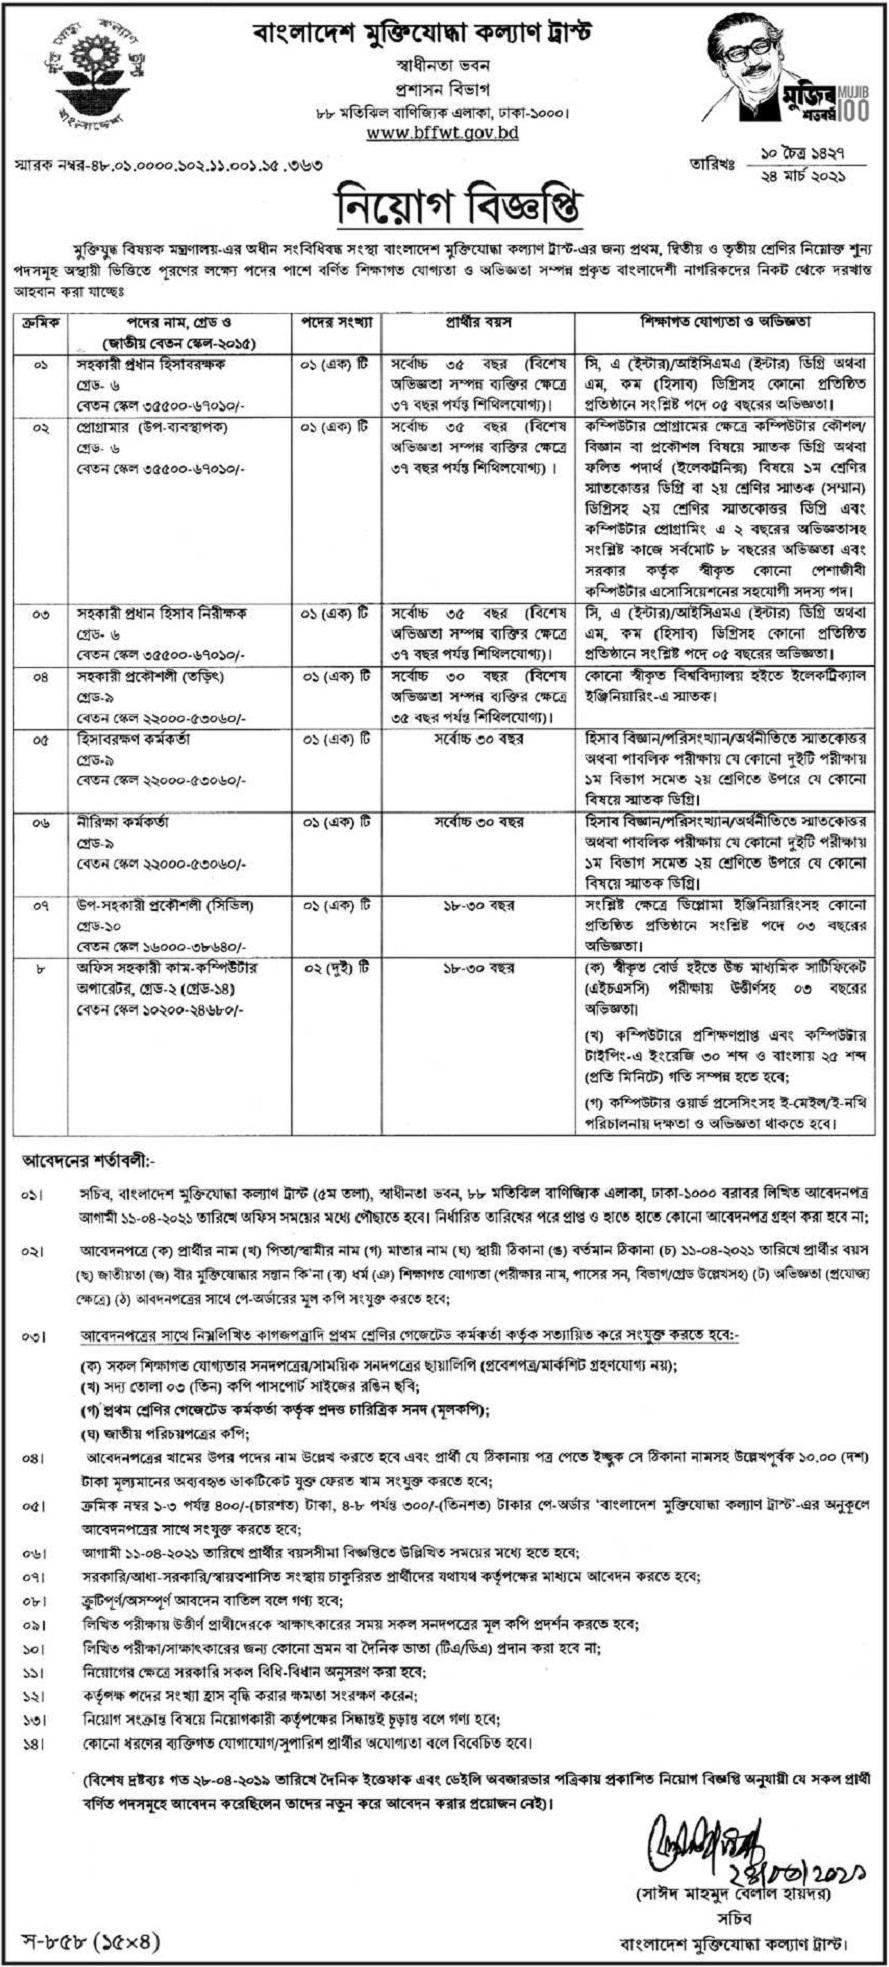 Bangladesh Freedom Fighter Welfare Trust Job Circular April 2021